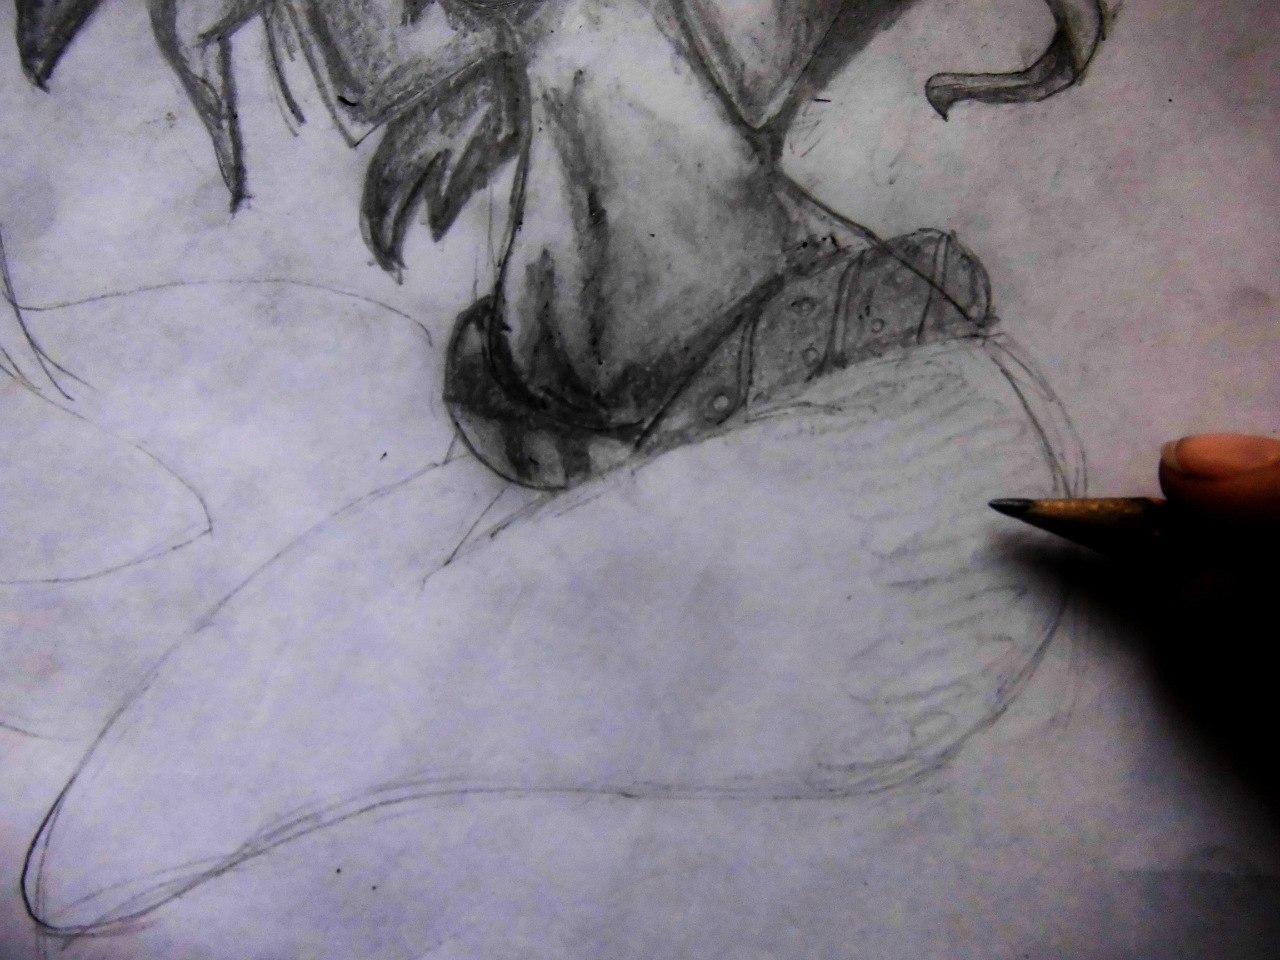 Рисуем милую Ариэль  на бумаге - шаг 13